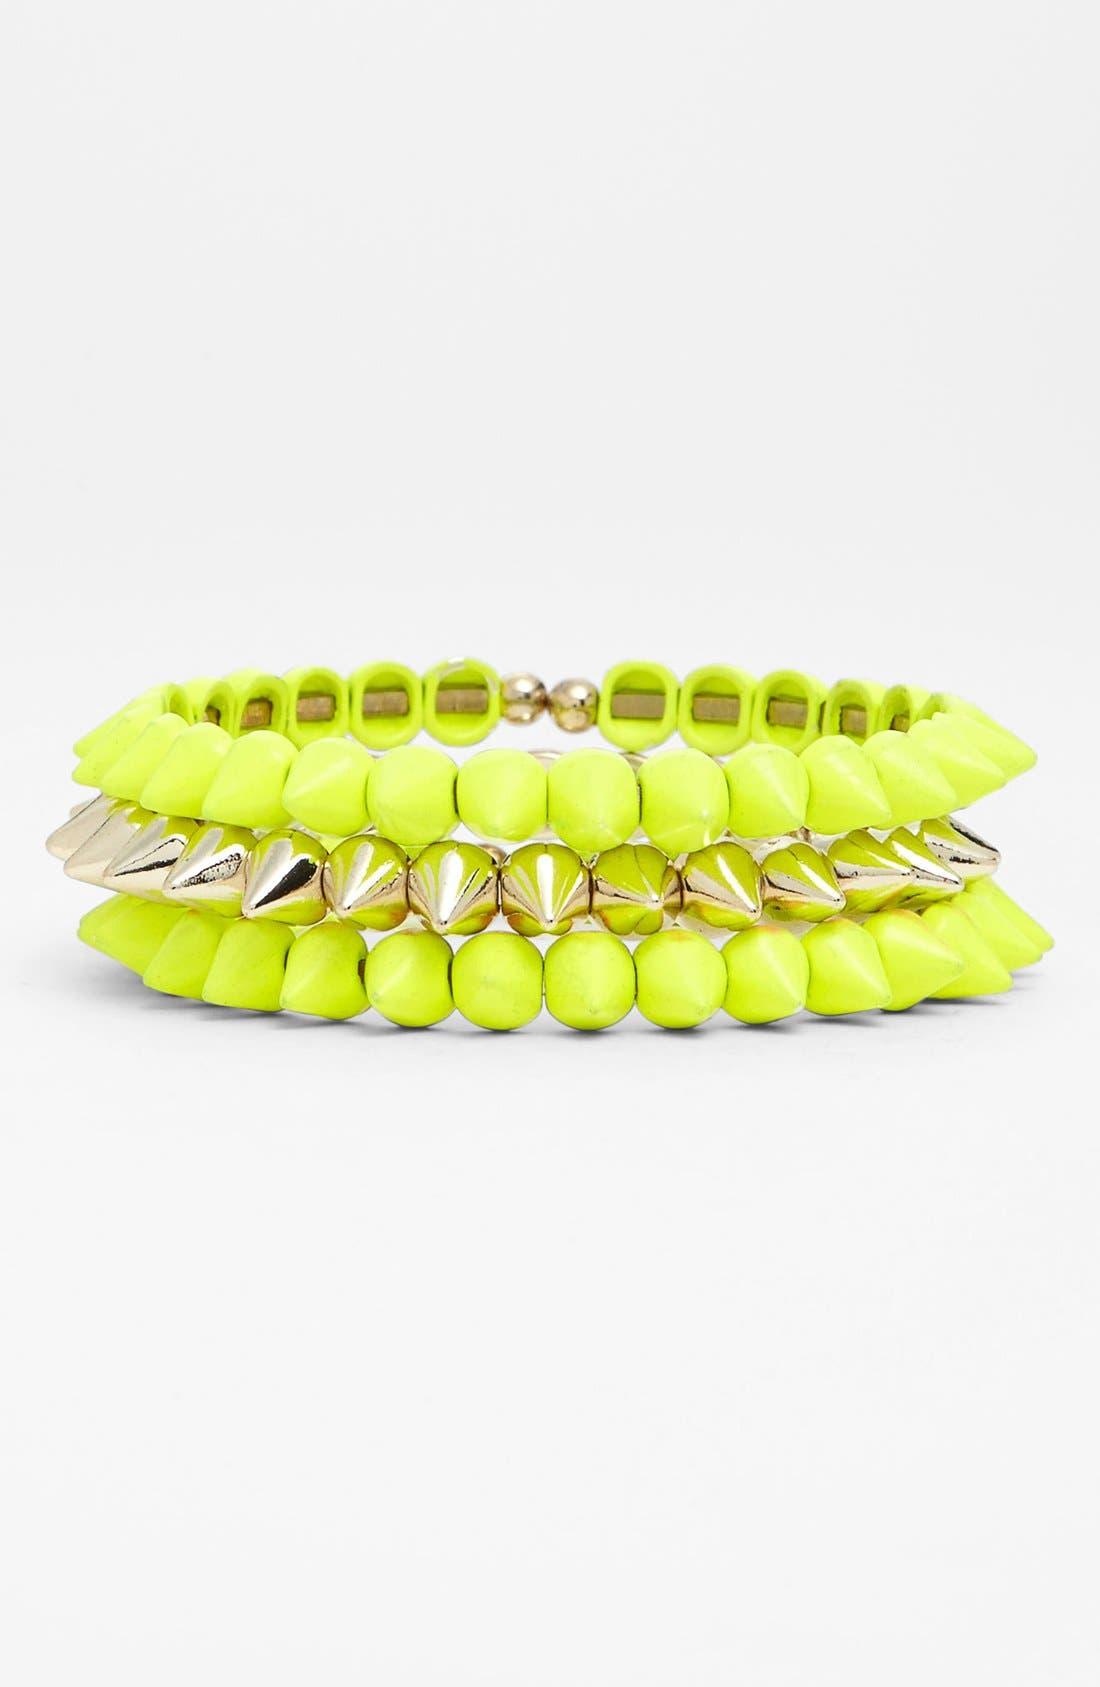 Alternate Image 1 Selected - Tasha Spike Stretch Bracelets (Set of 3)